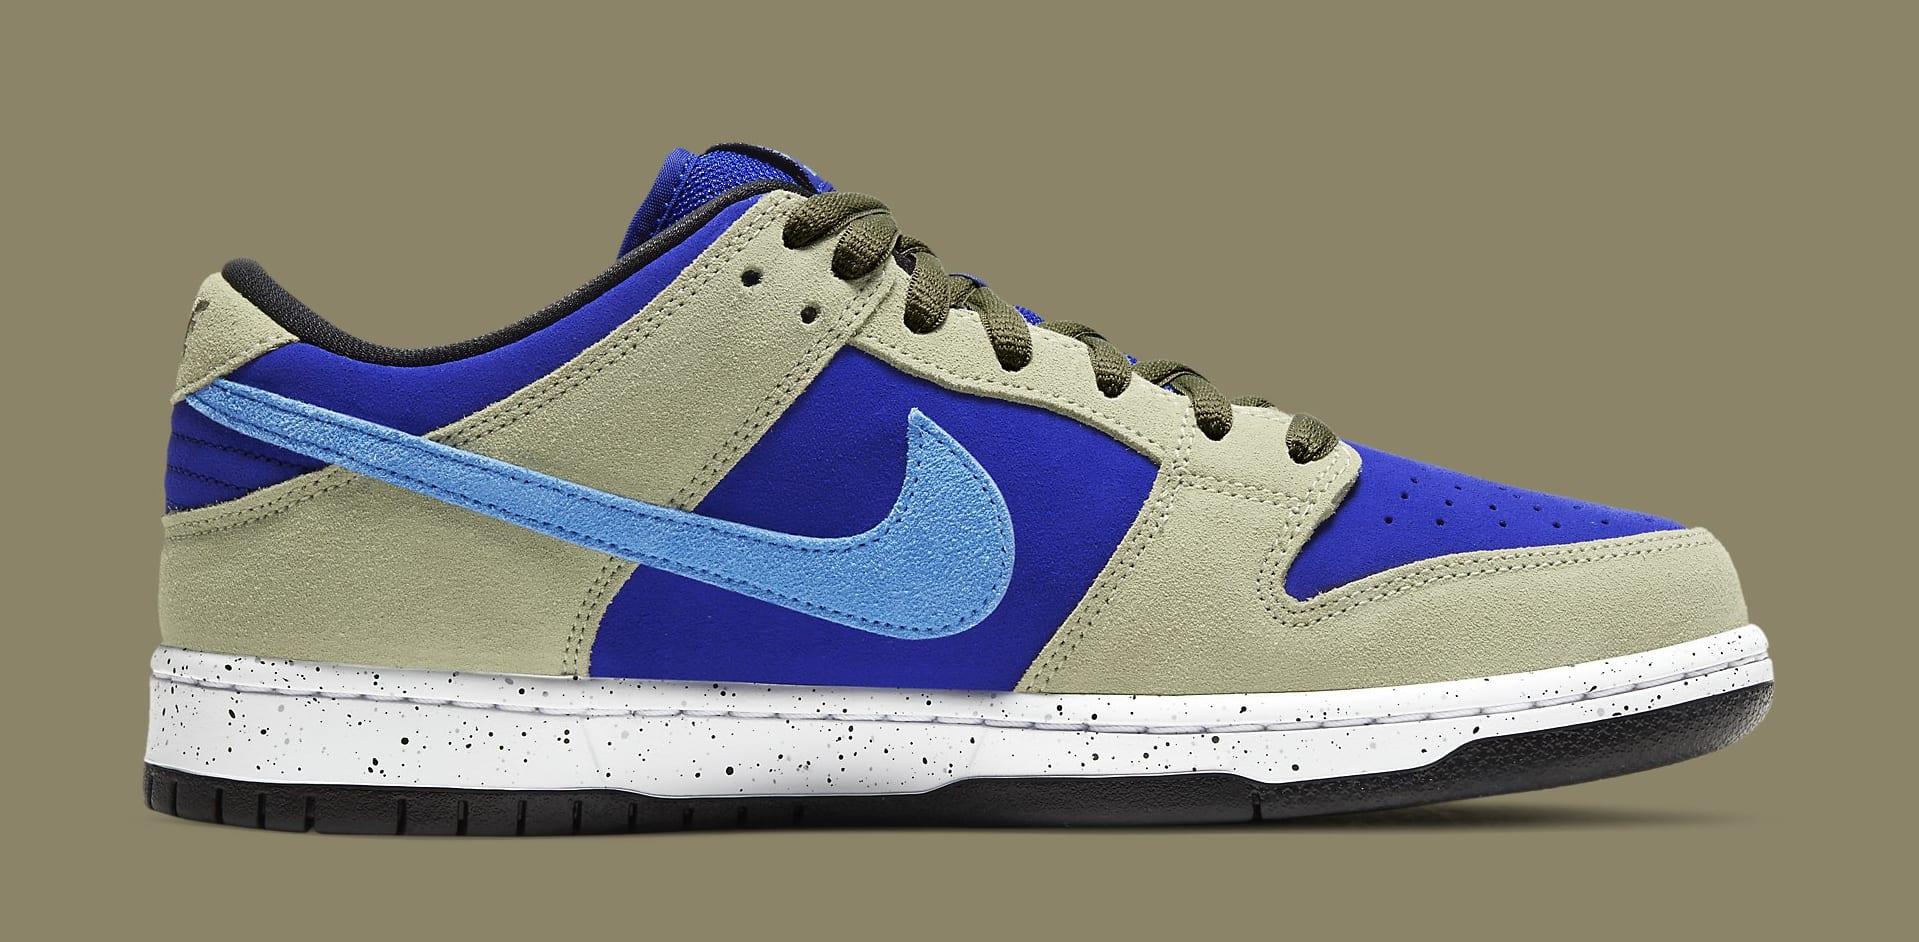 Nike SB Dunk Low 'ACG Caldera' BQ6817-301 Medial